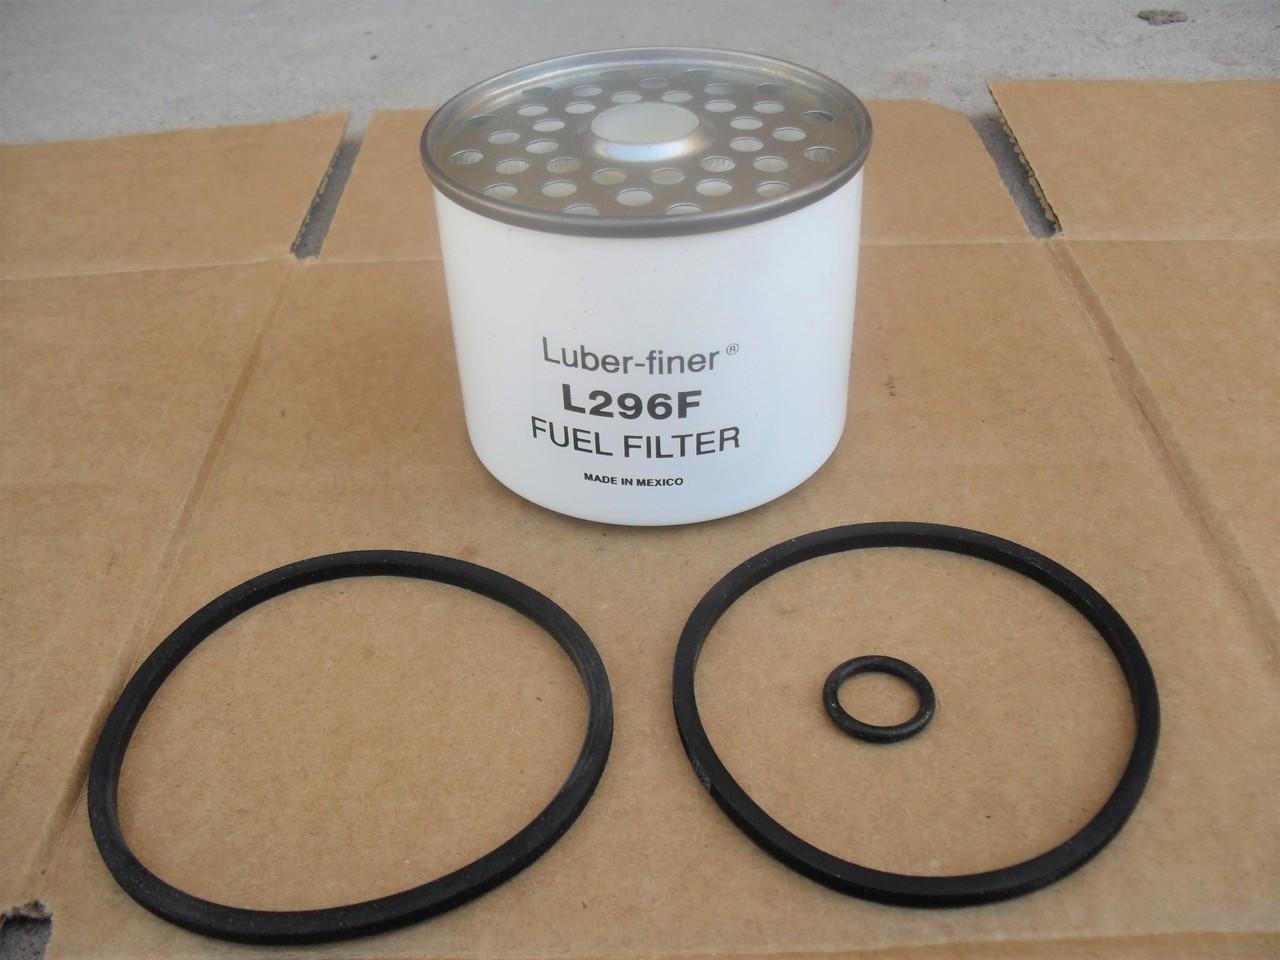 medium resolution of fuel filter for vermeer m450 m475 m485 m485 m50 v430 v434 trencher 15340001 20776001 81557001 www lawnmowerpartstore com